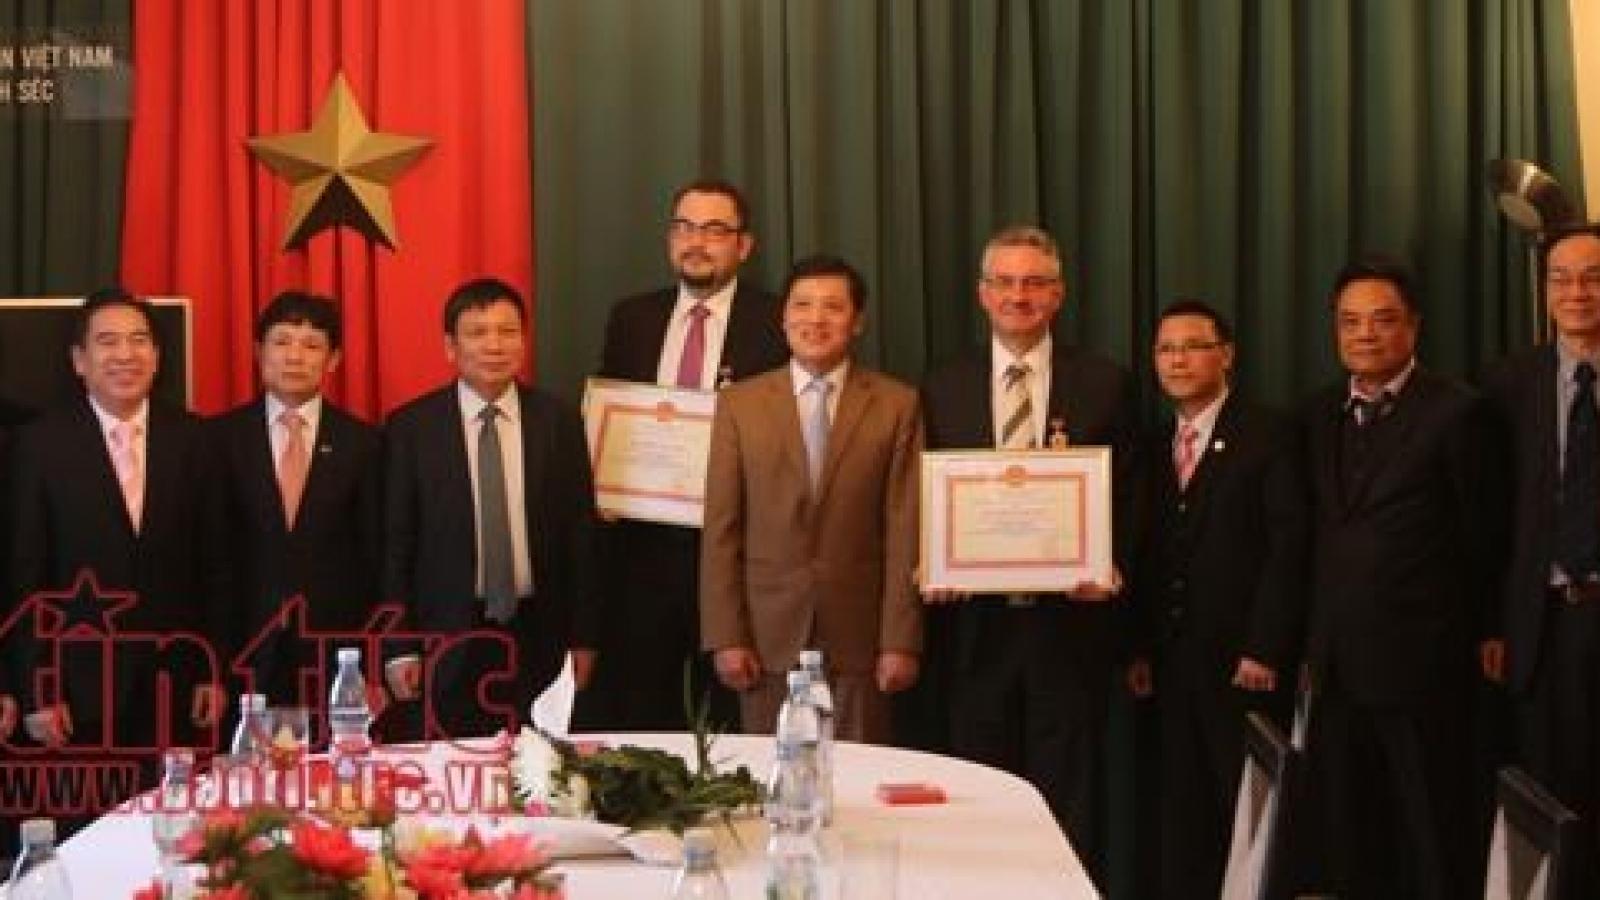 Czech promoters of Vietnamese culture honoured